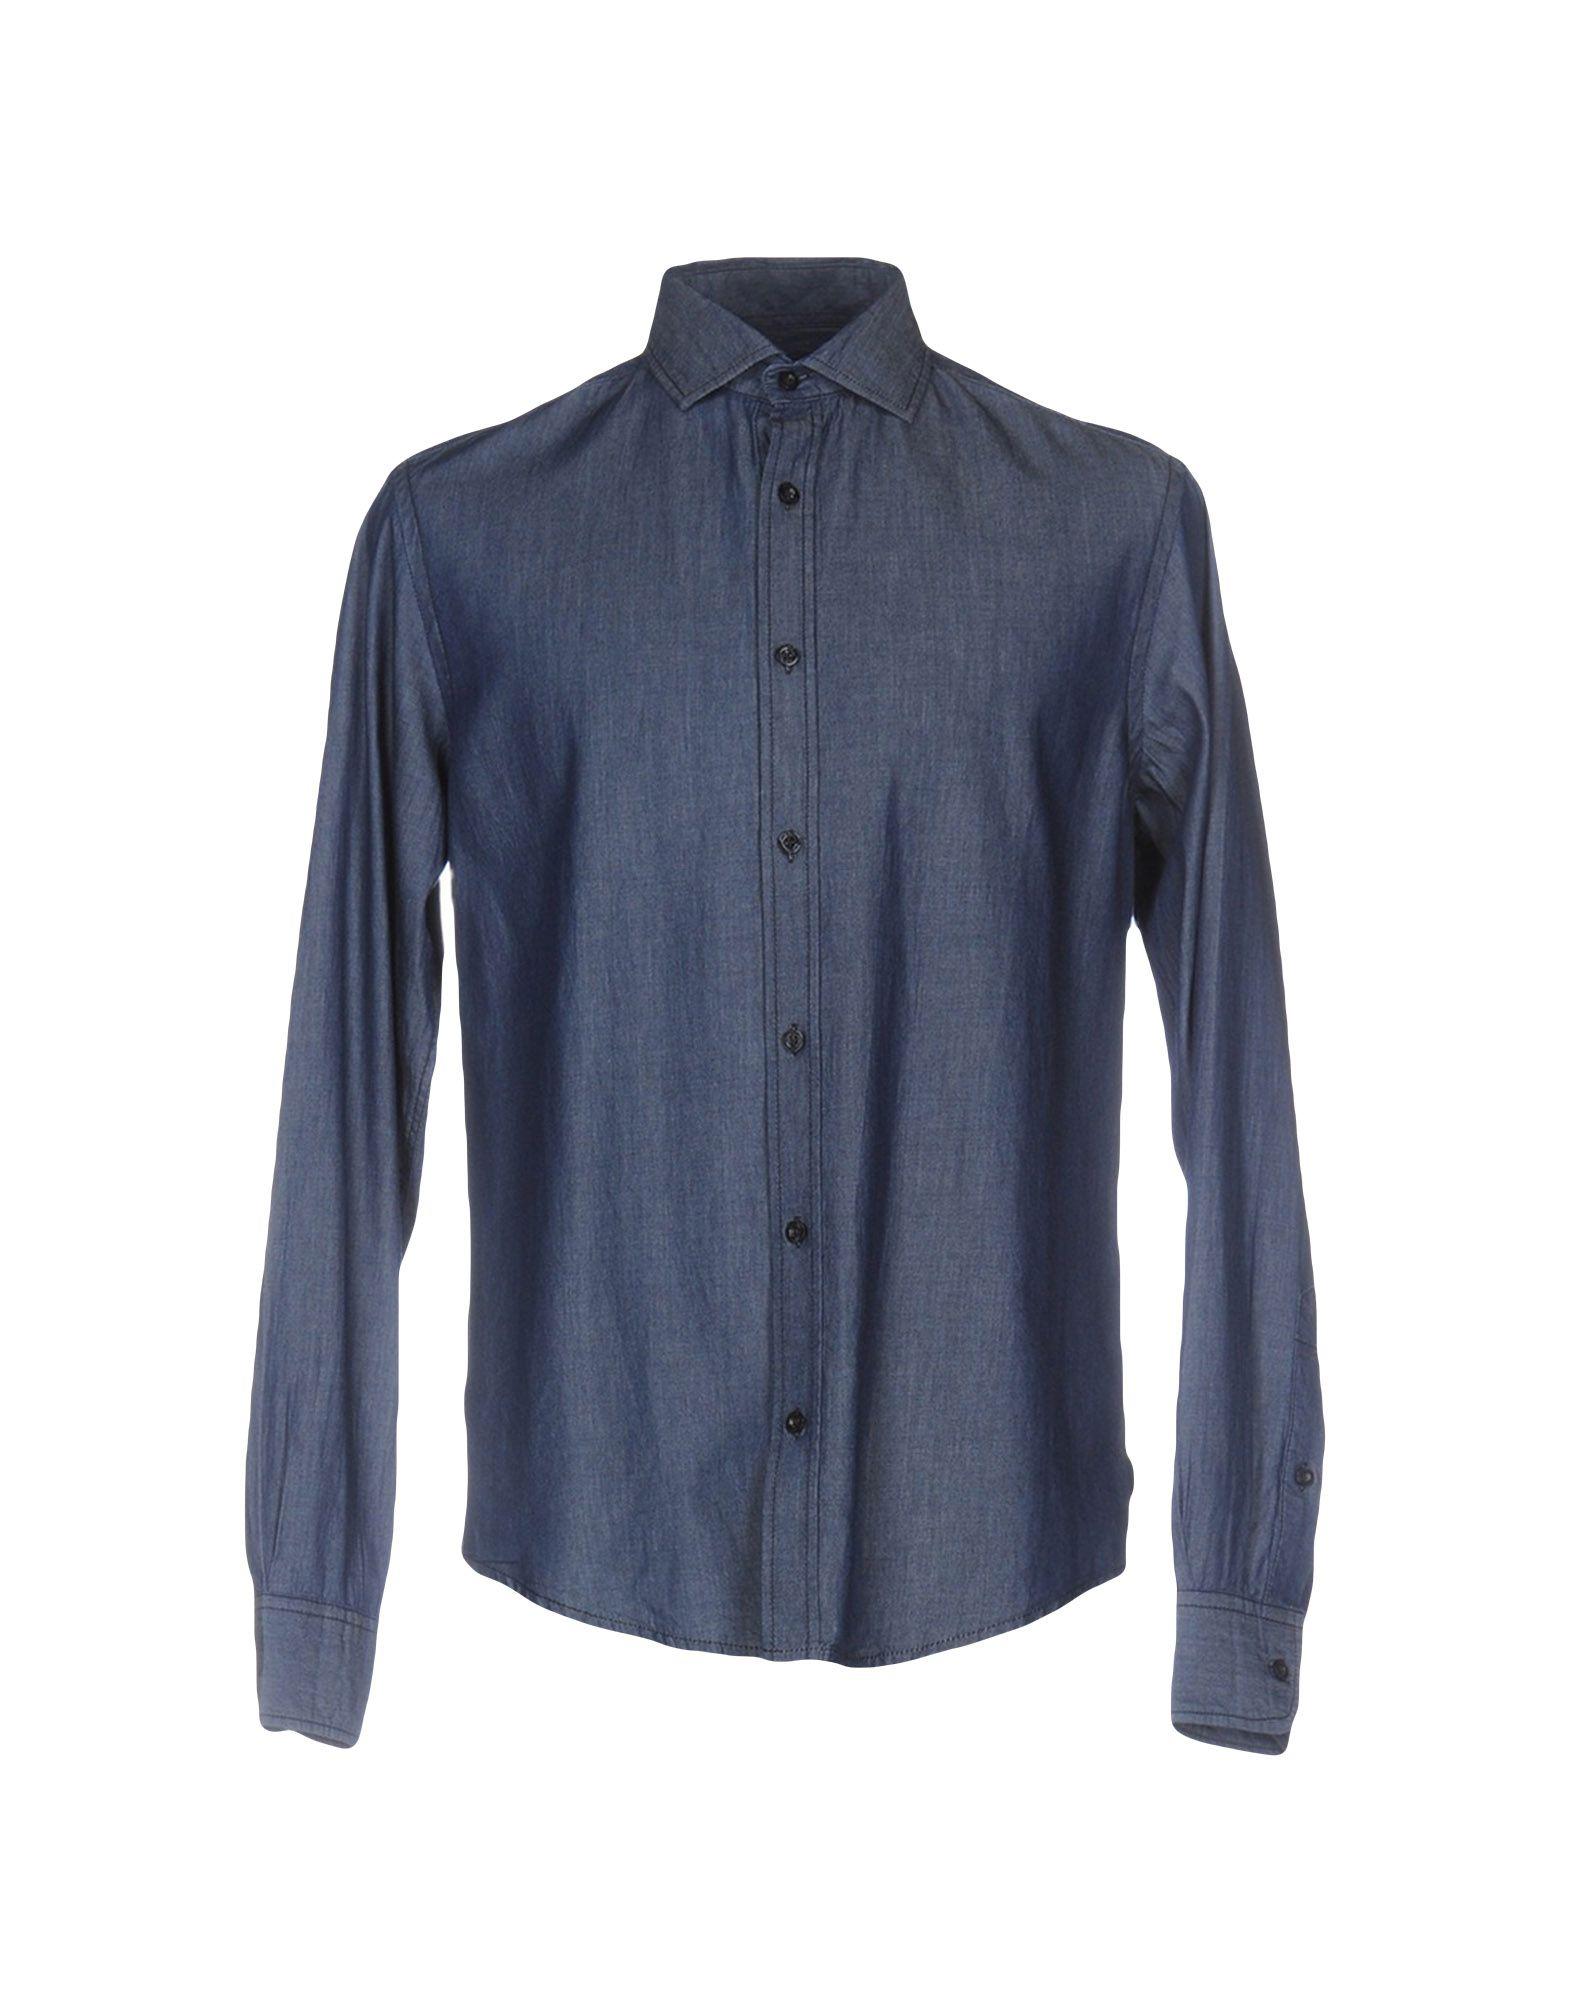 ARMANI JEANS Джинсовая рубашка